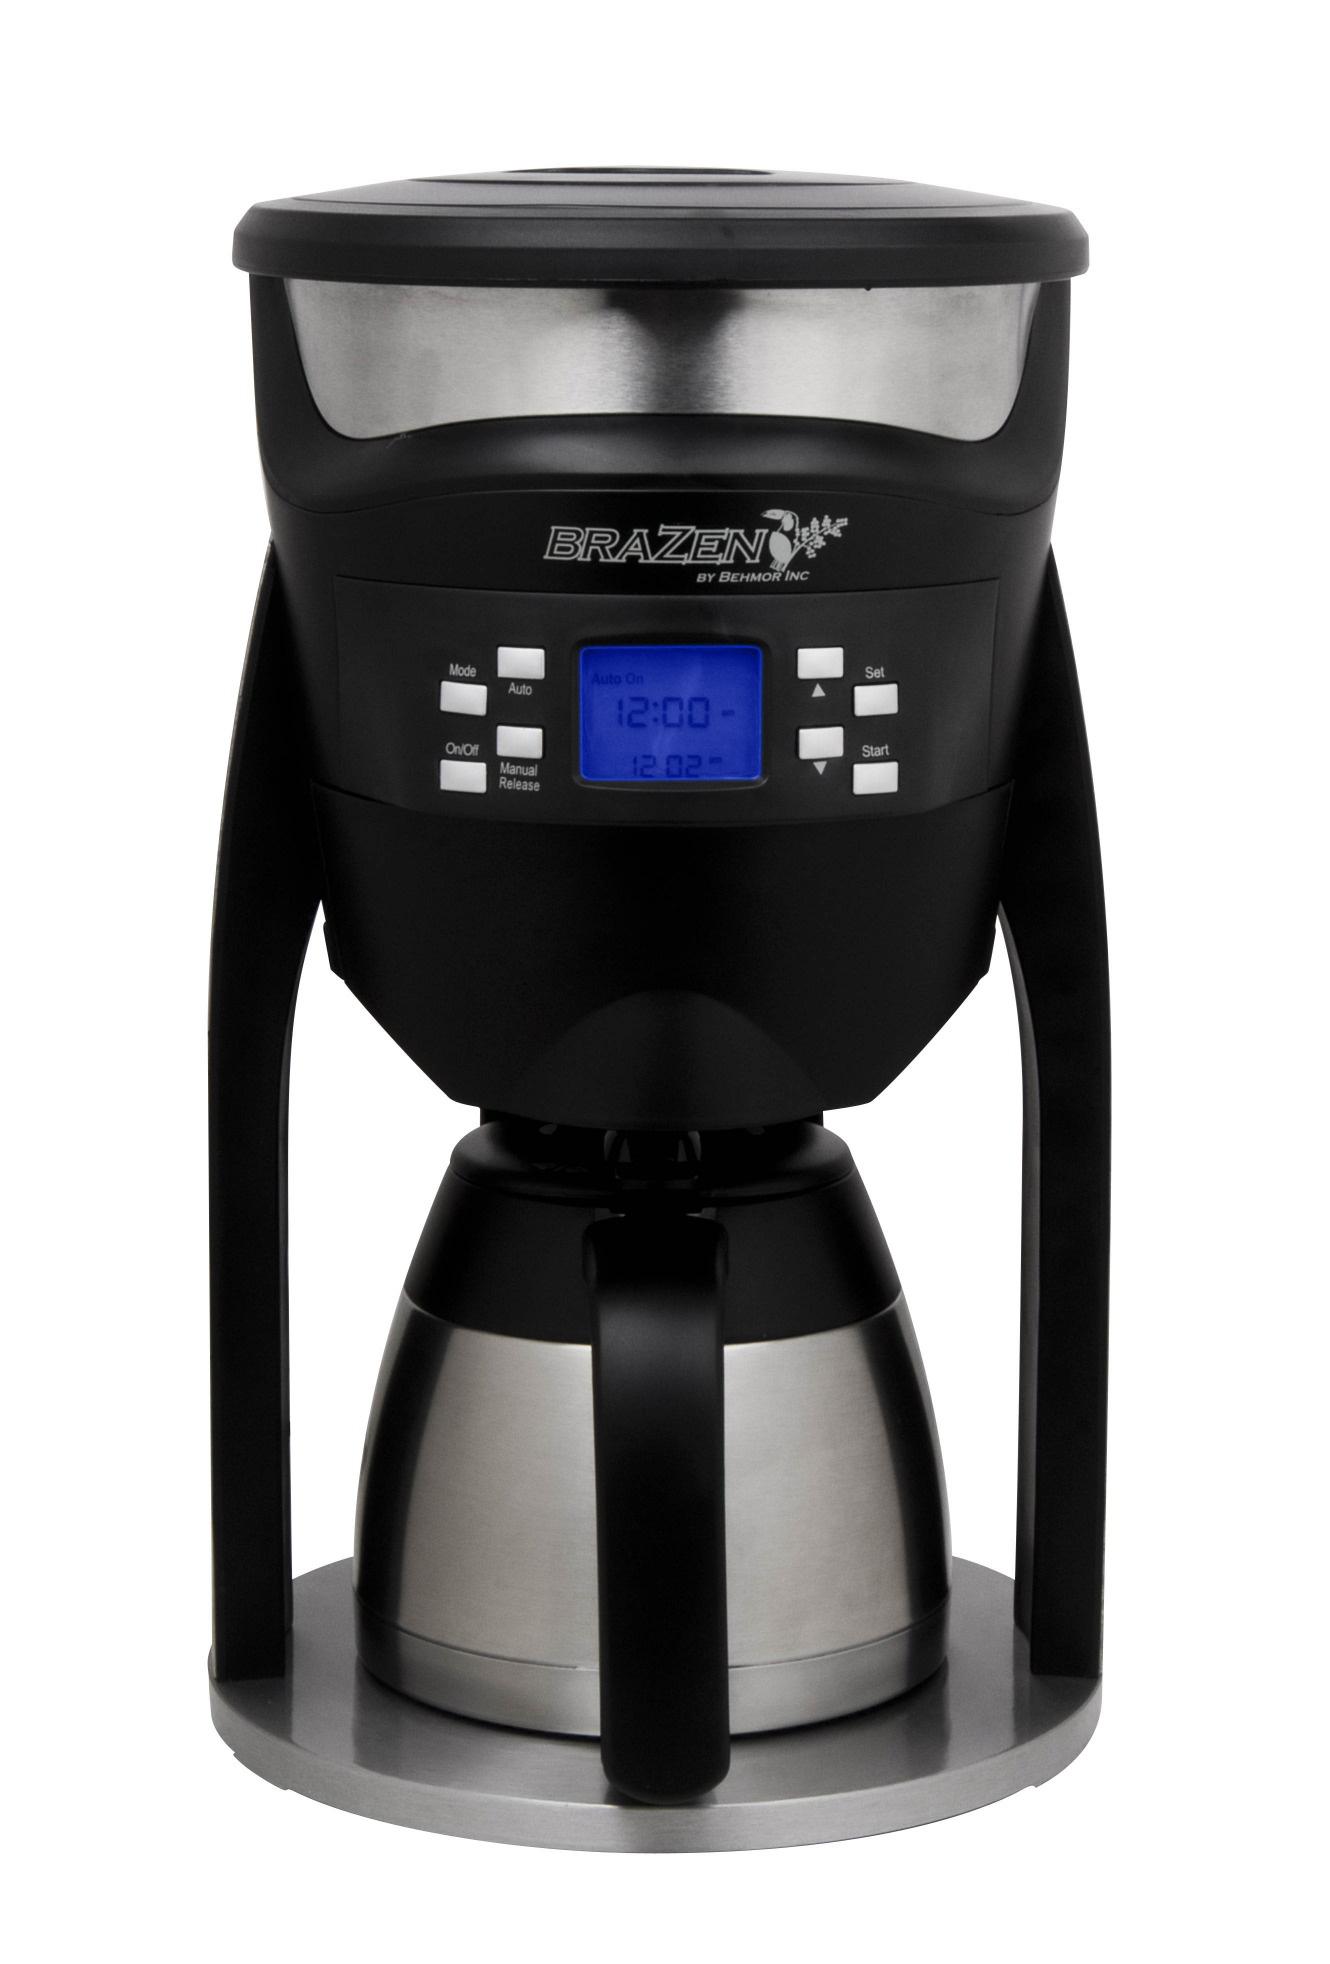 Ezvid Coffee Maker Reviews : Behmor BraZen Brewer Review